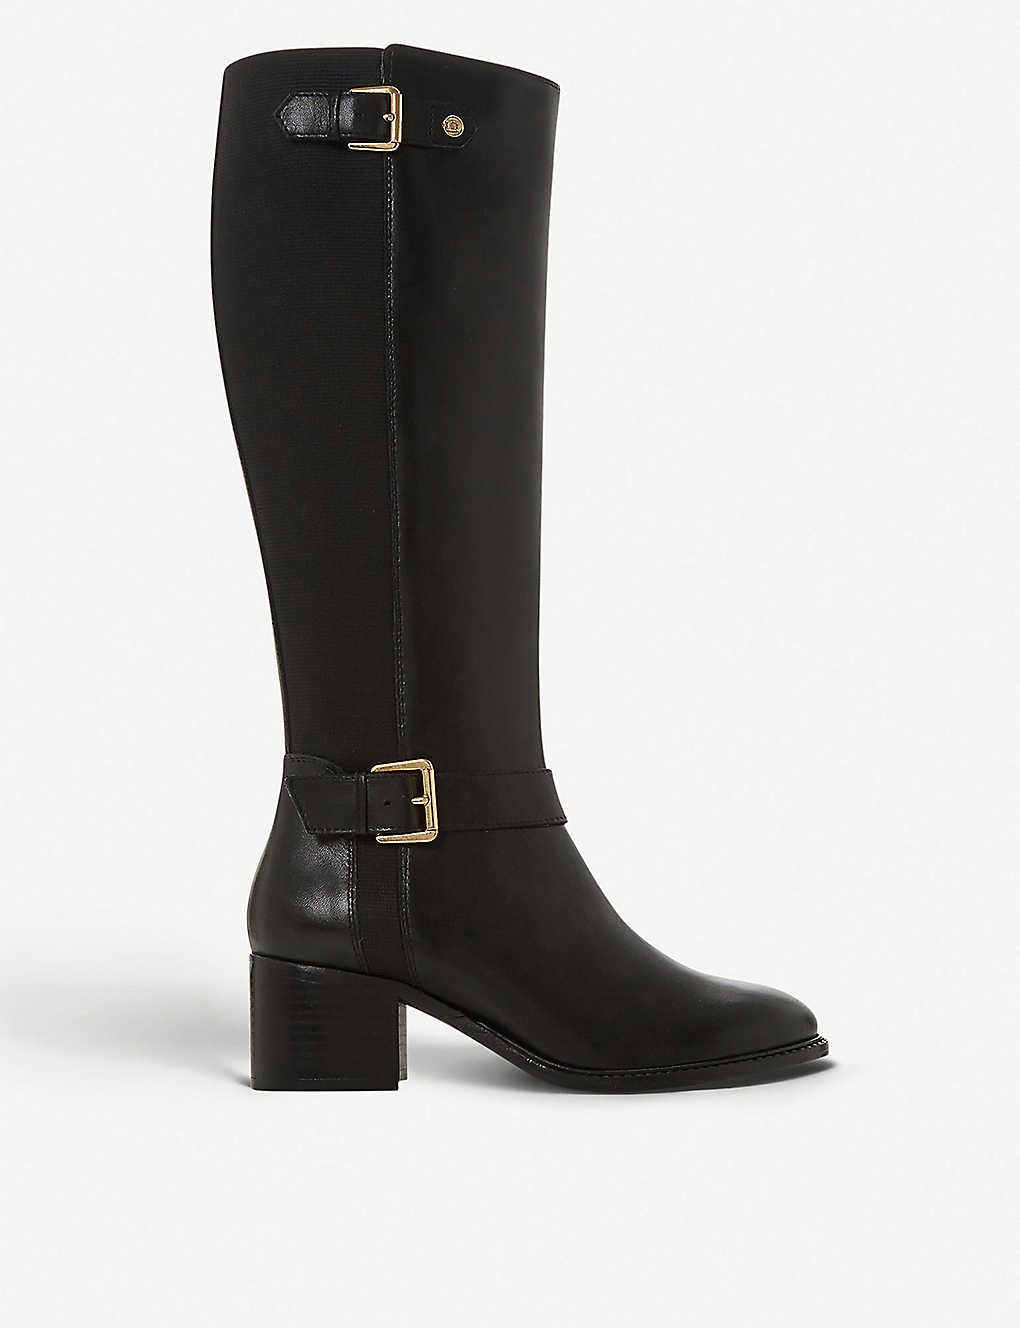 883d9054635 Tildaa block heel leather riding boots